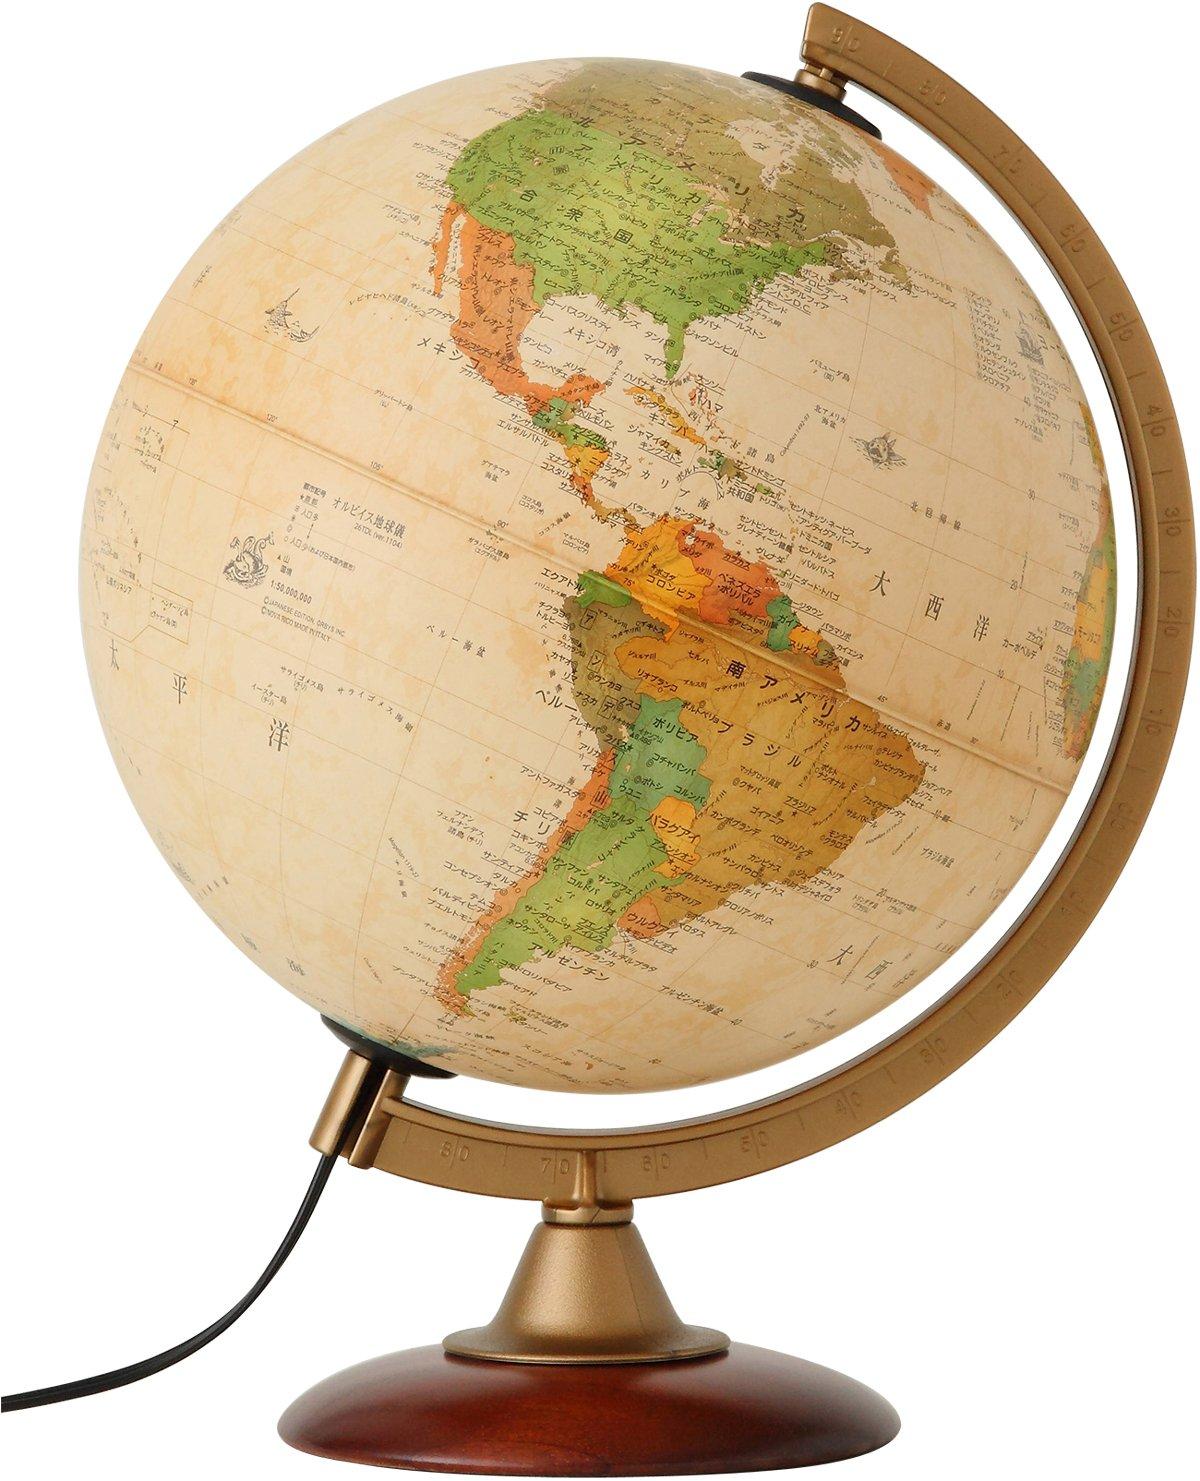 Amazon.co.jp: 地球儀 - 学校用教材: 文房具・オフィス ...